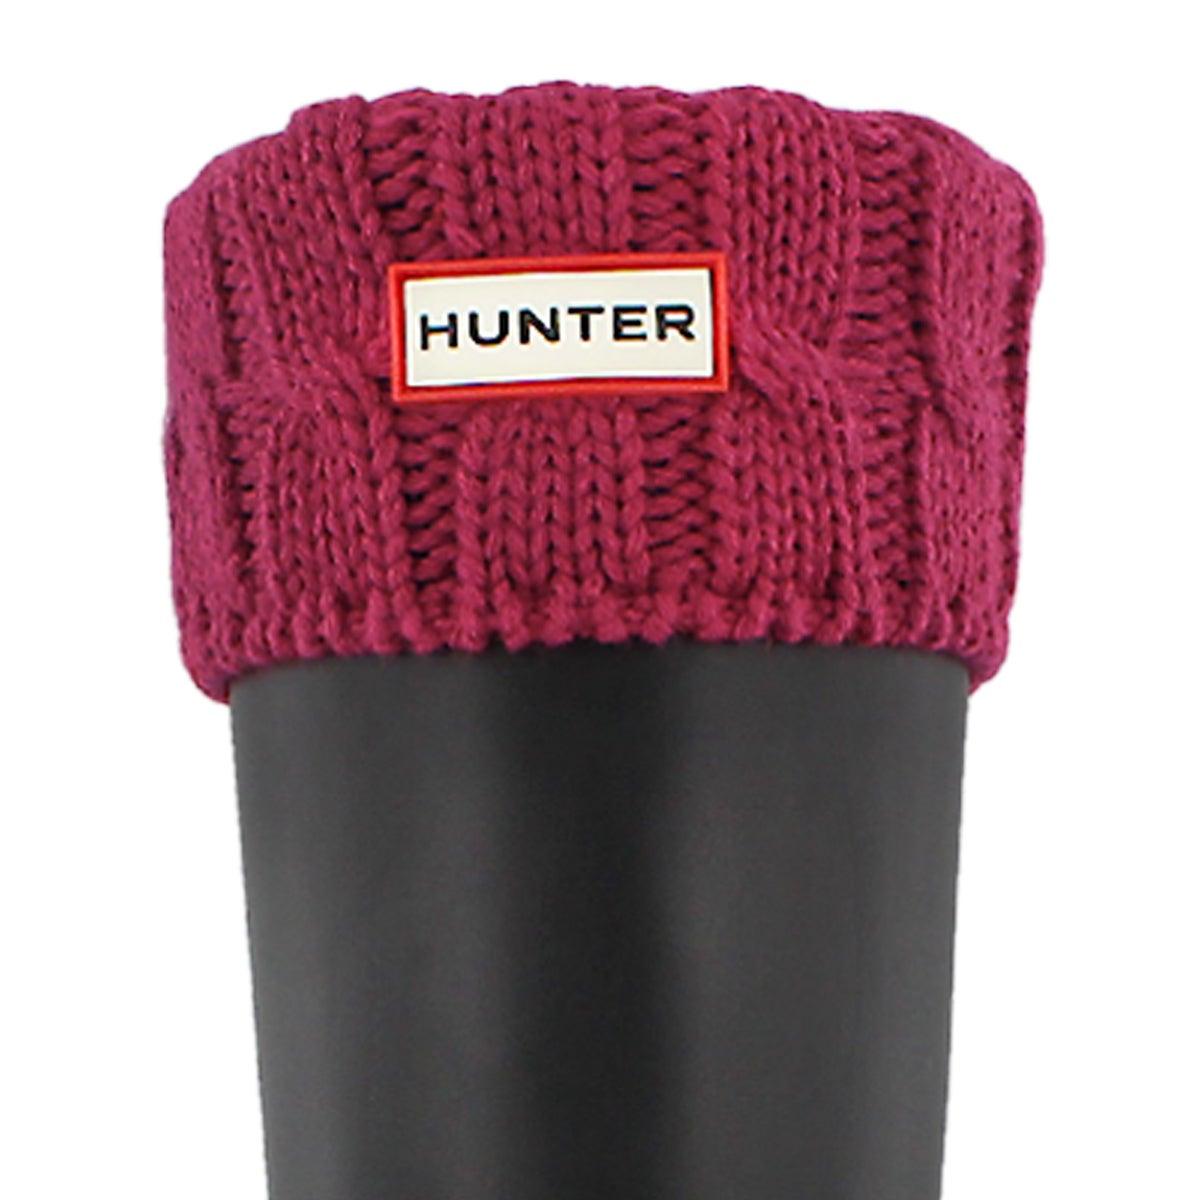 Women's 6 STITCH CABLE dark pink boot socks